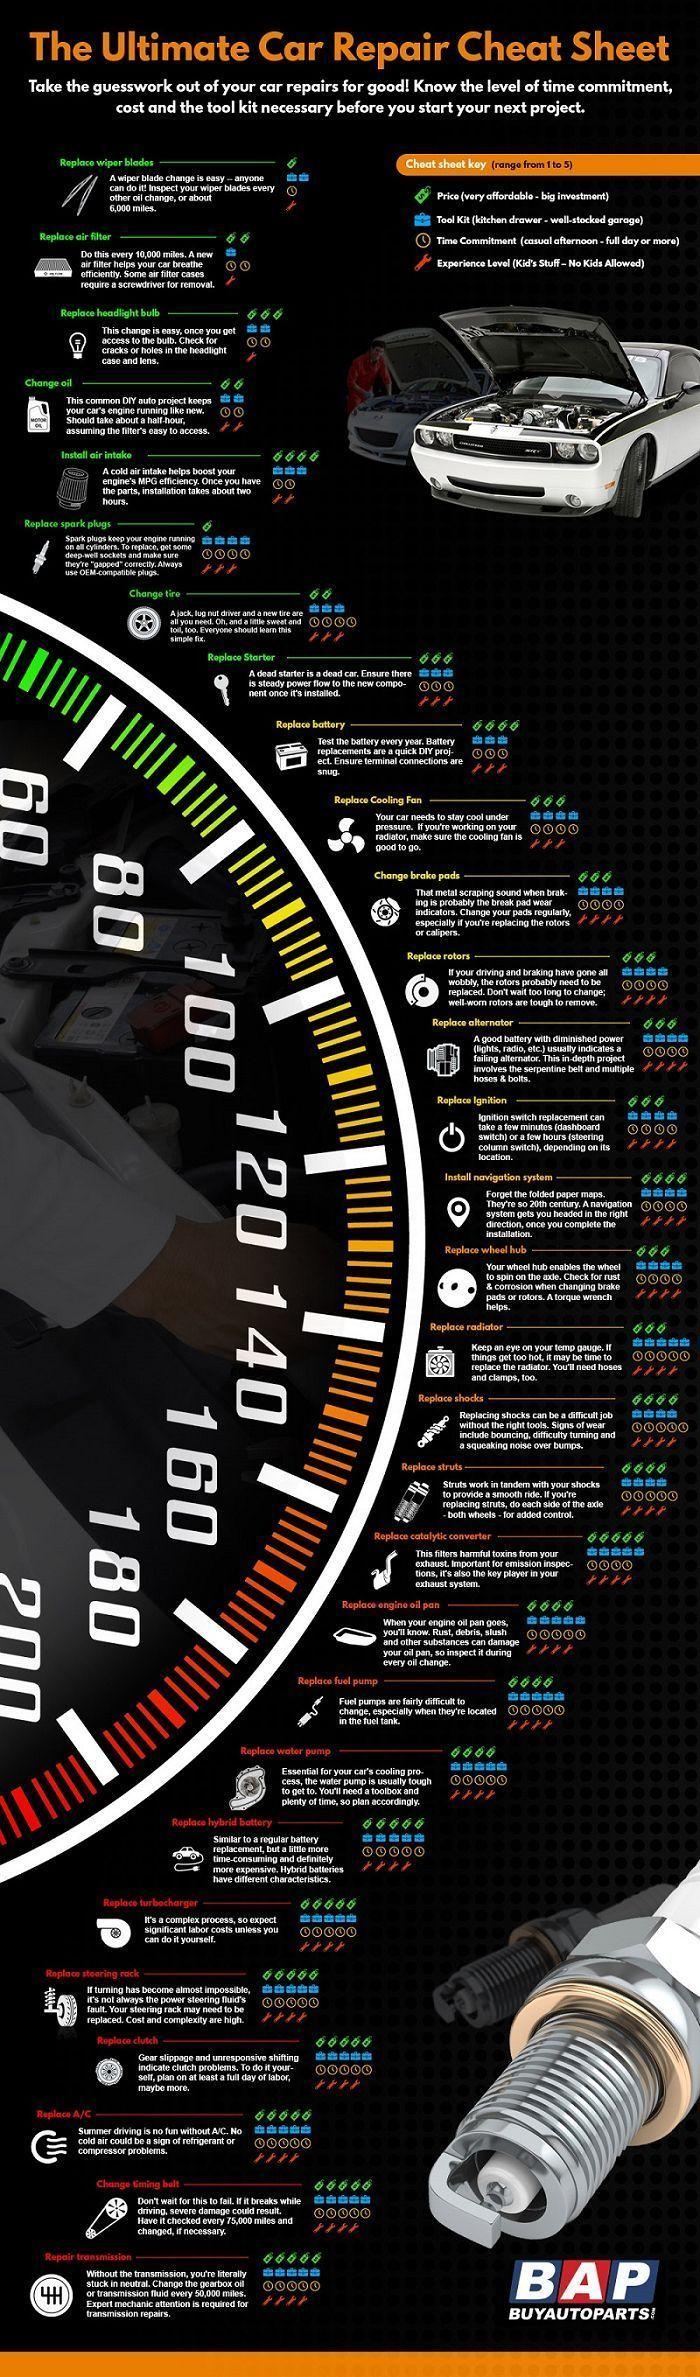 Infographic The Ultimate Car Repair Cheat Sheet Allthingstech Car Hacks Car Maintenance Car Care Tips